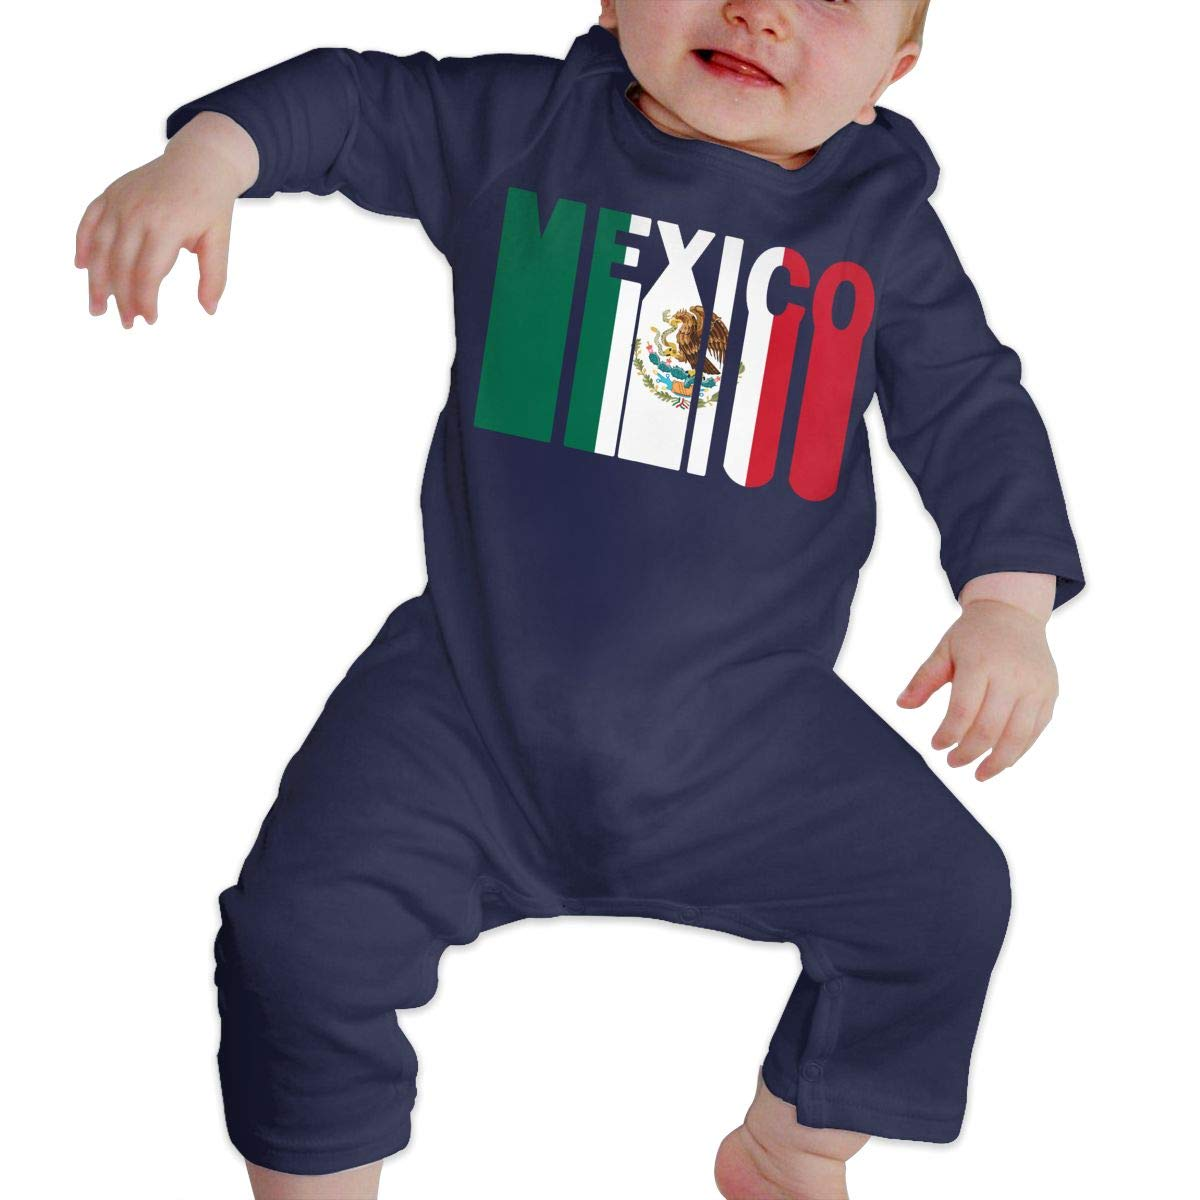 LBJQ8 Retro Mexico Flag Infant Baby Girl Boys Organic Cotton Bodysuit Romper Jumpsuit